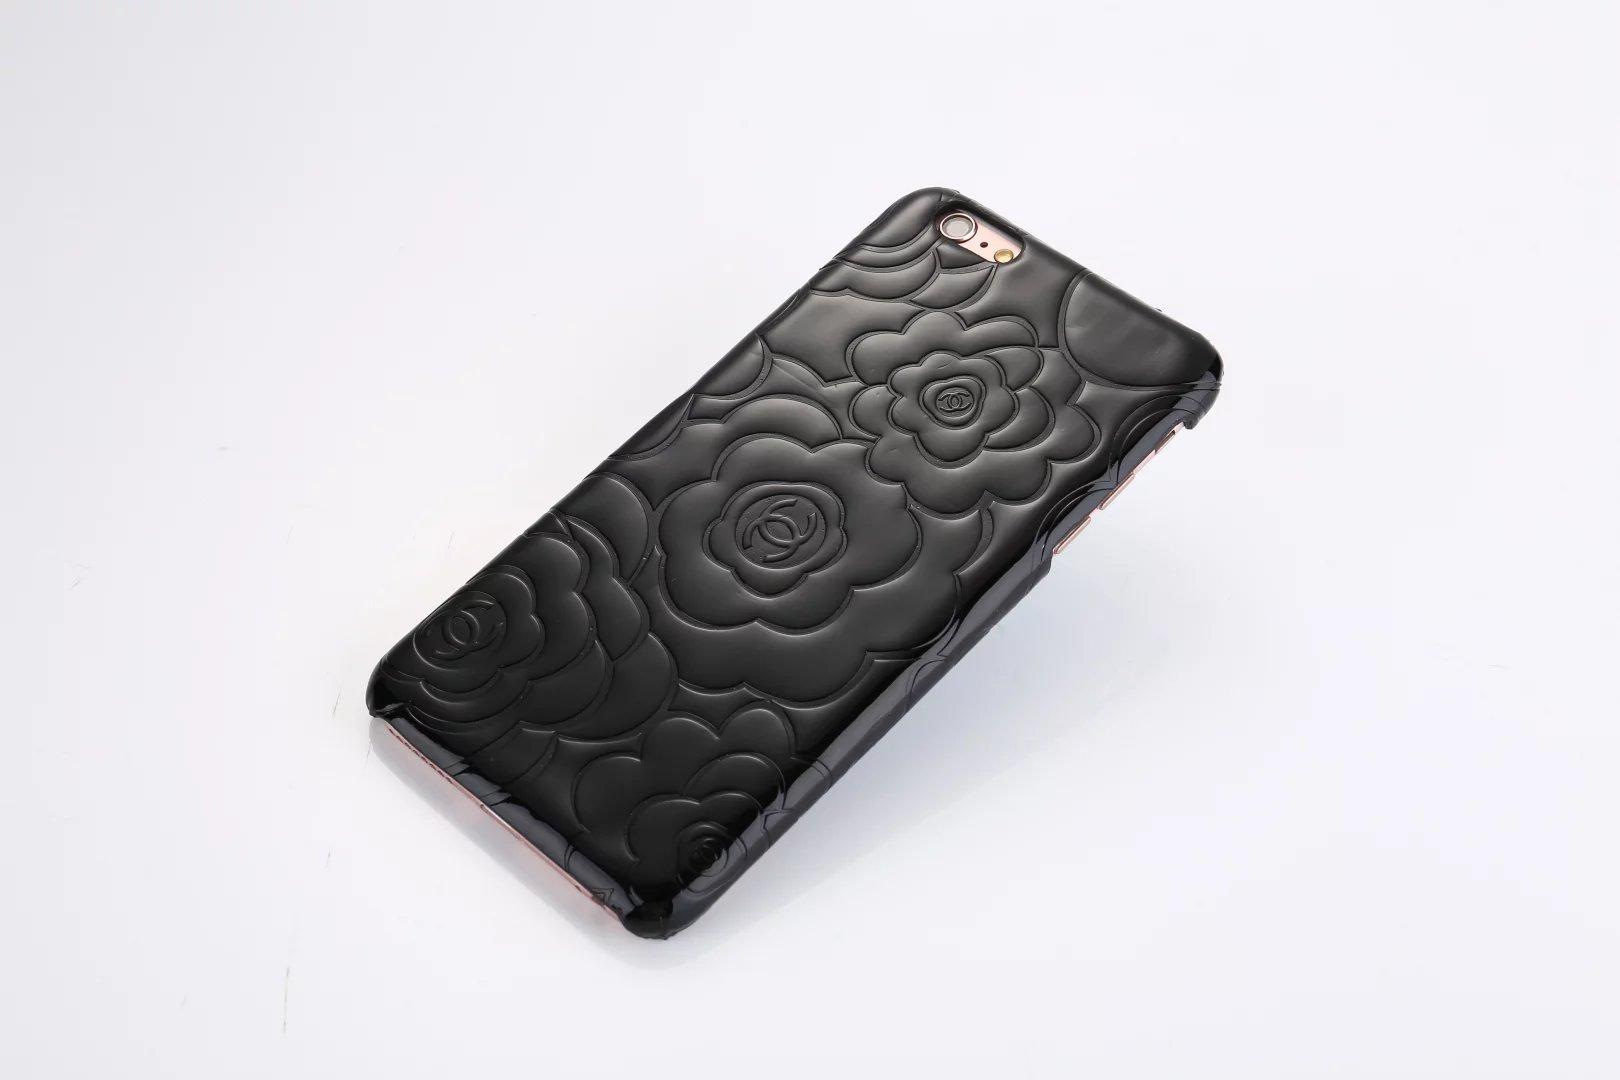 edle iphone hüllen case für iphone Chanel iphone7 hülle aluminium hülle iphone 7 iphone hülle bedrucken las7n handyhülle s2 iphone ca7 individuell cover 7lbst erstellen handyhülle iphone 3gs 7lbst gestalten